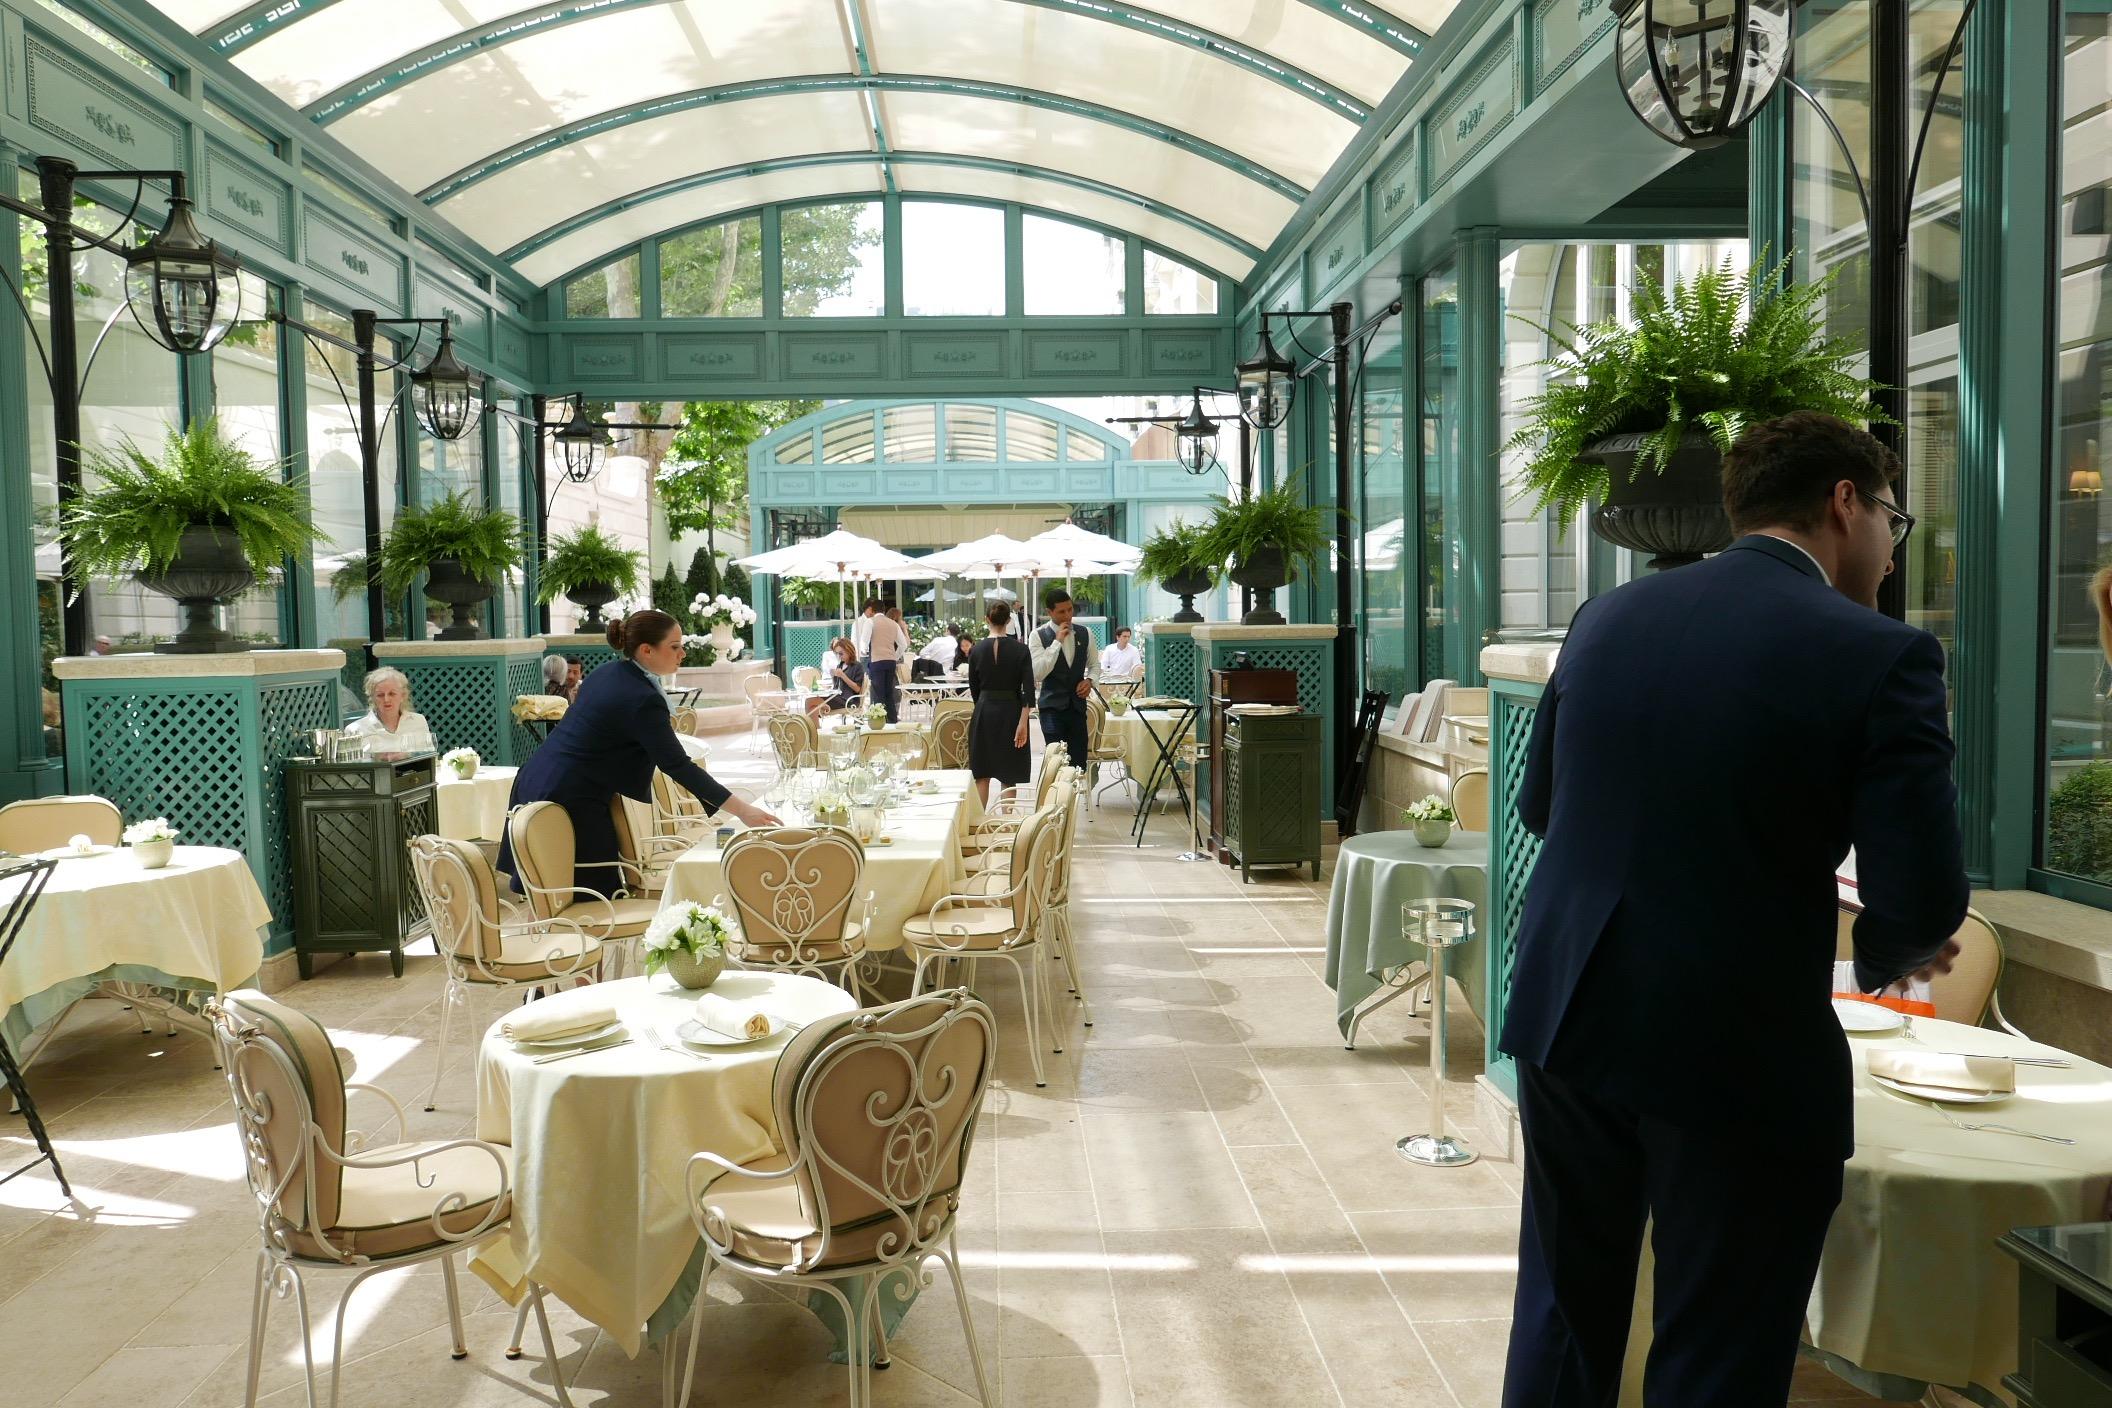 Le jardin de l espadon - Au jardin restaurant paris ...